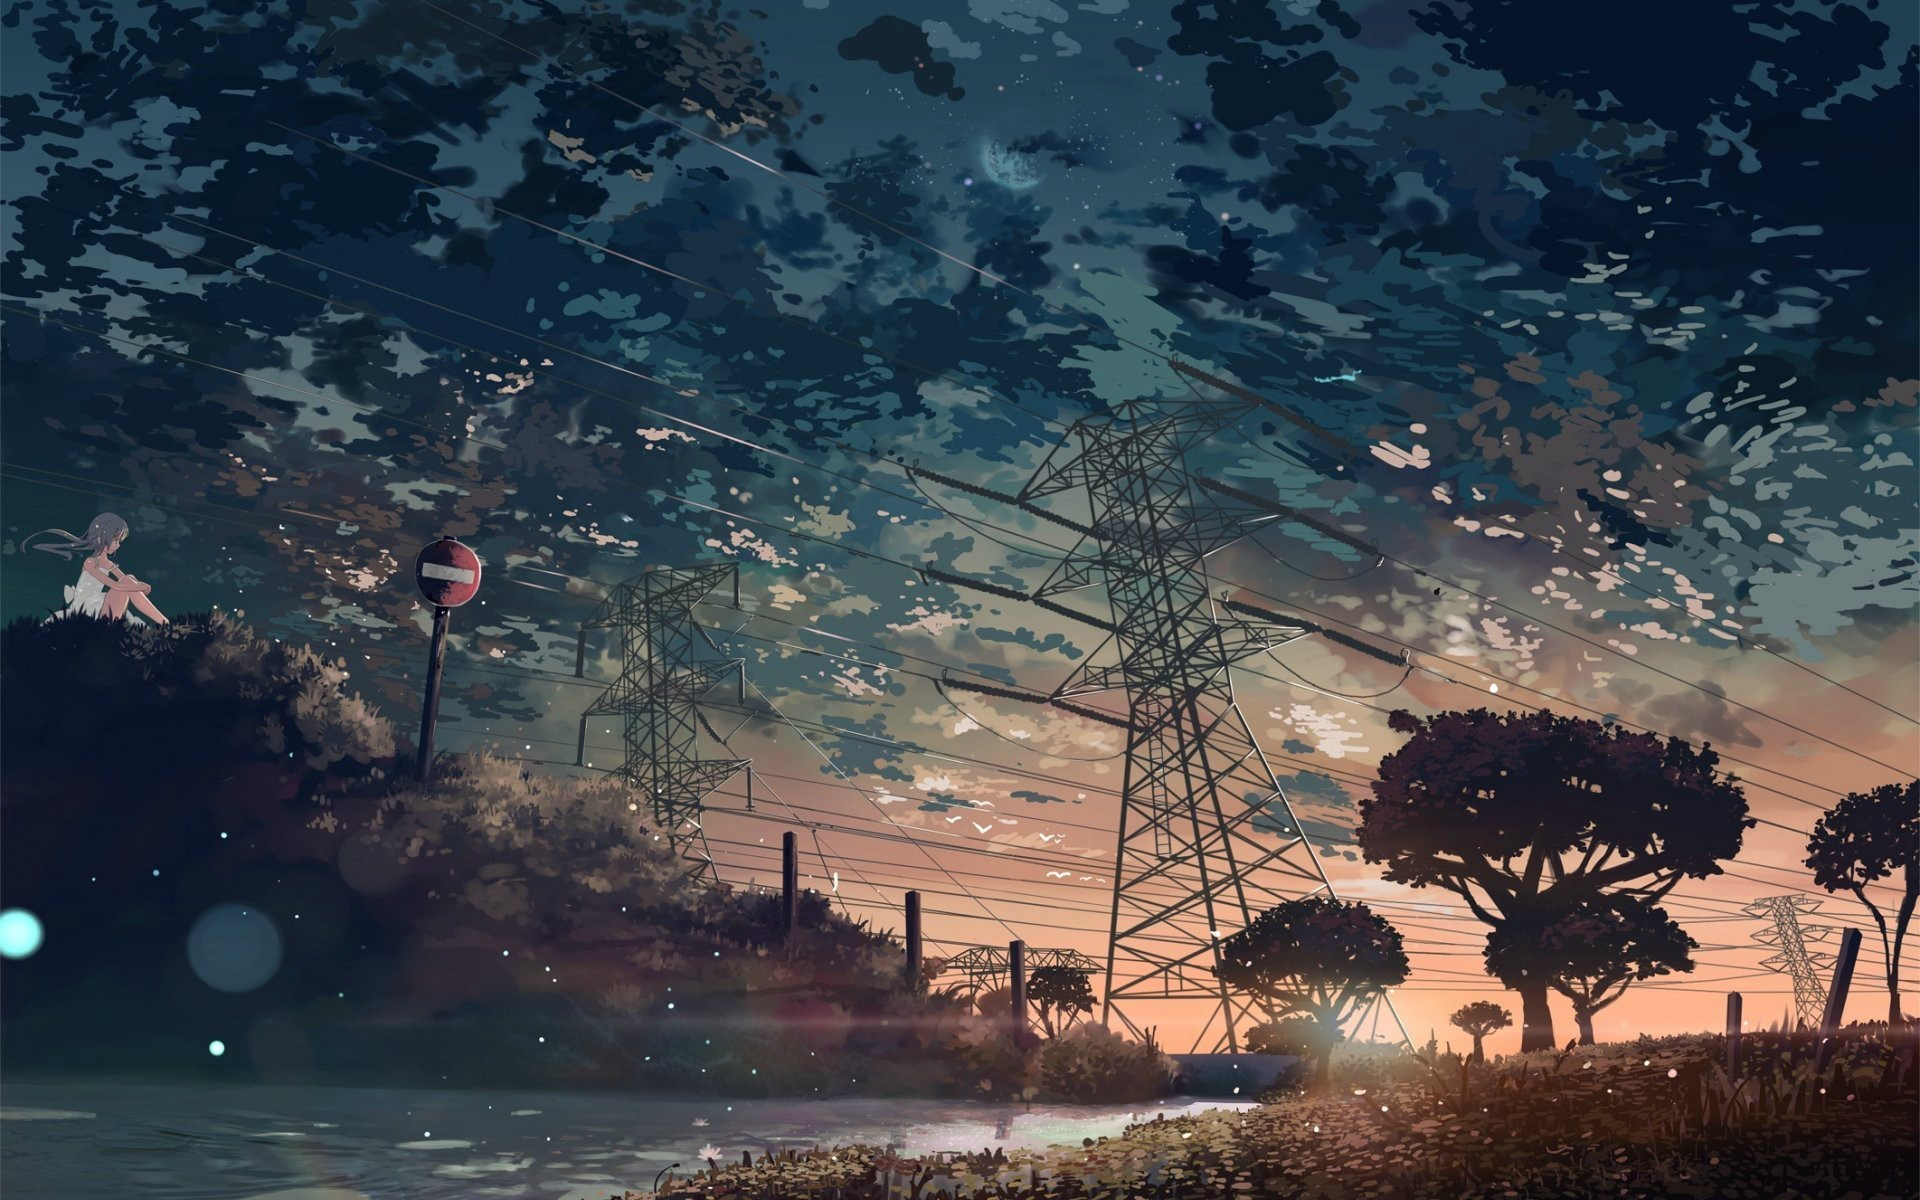 Anime anime nature trees sky anime girls power lines